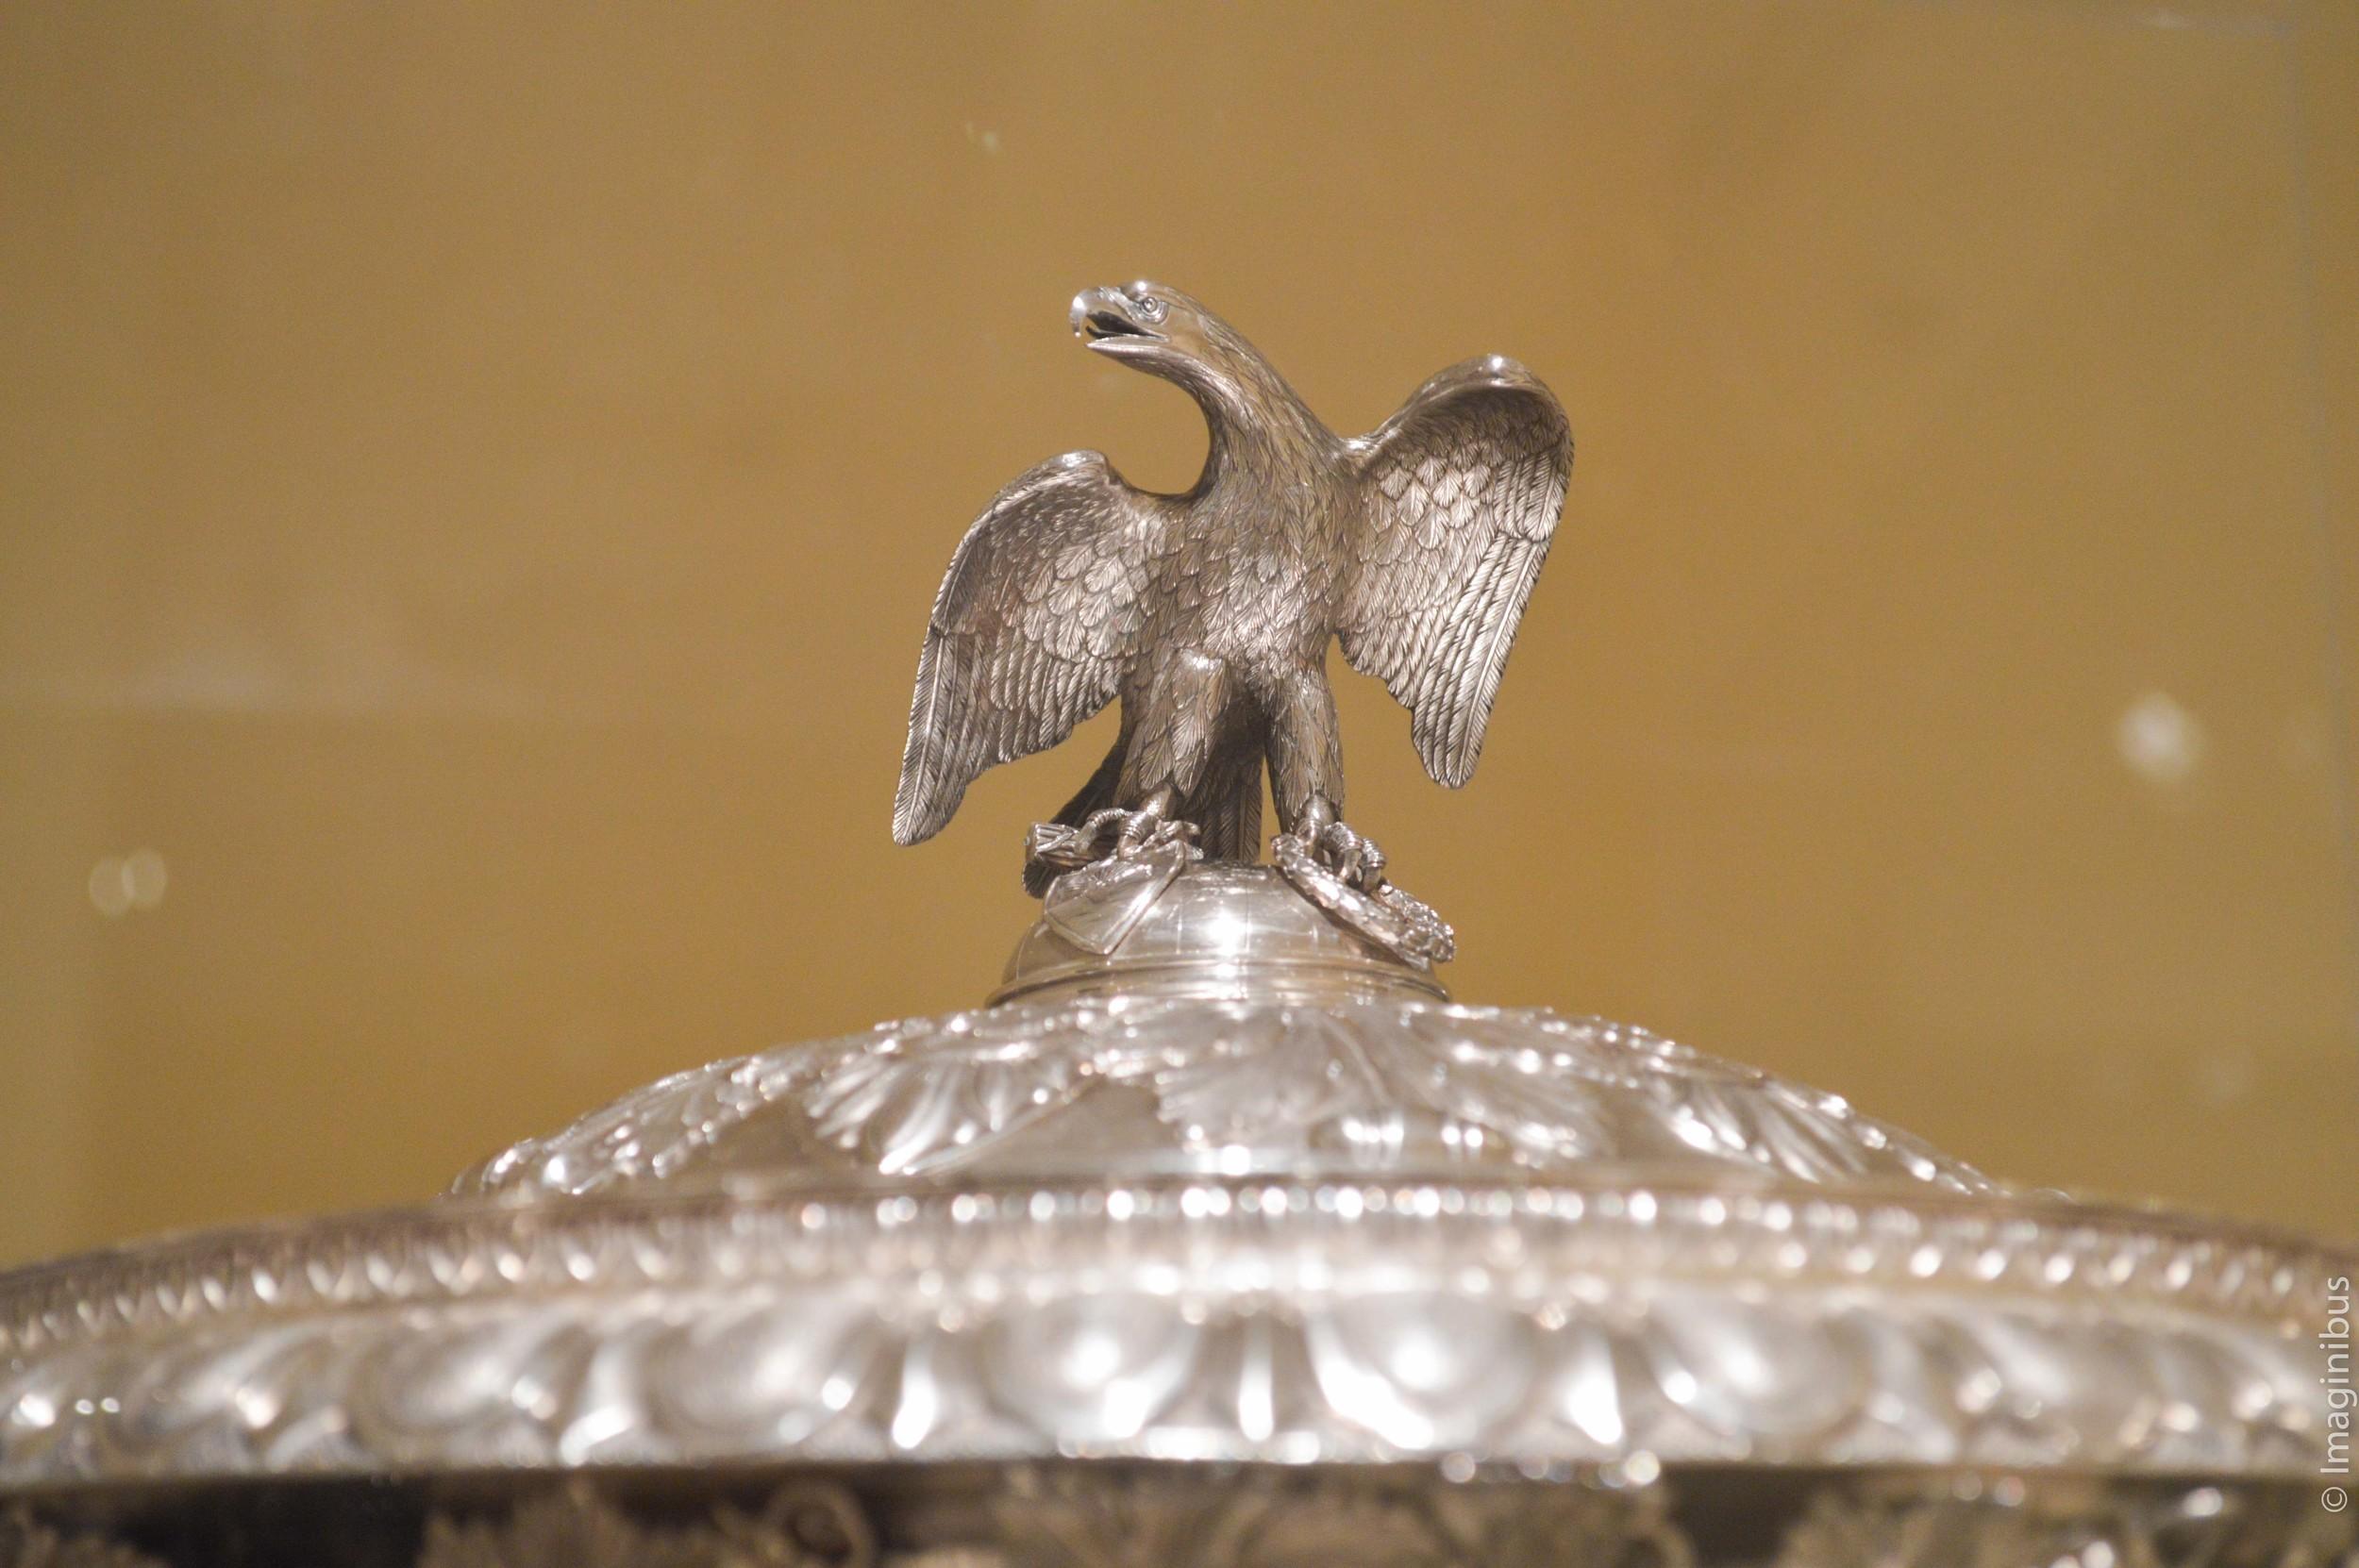 Bald Eagle, Metropolitan Museum of Art